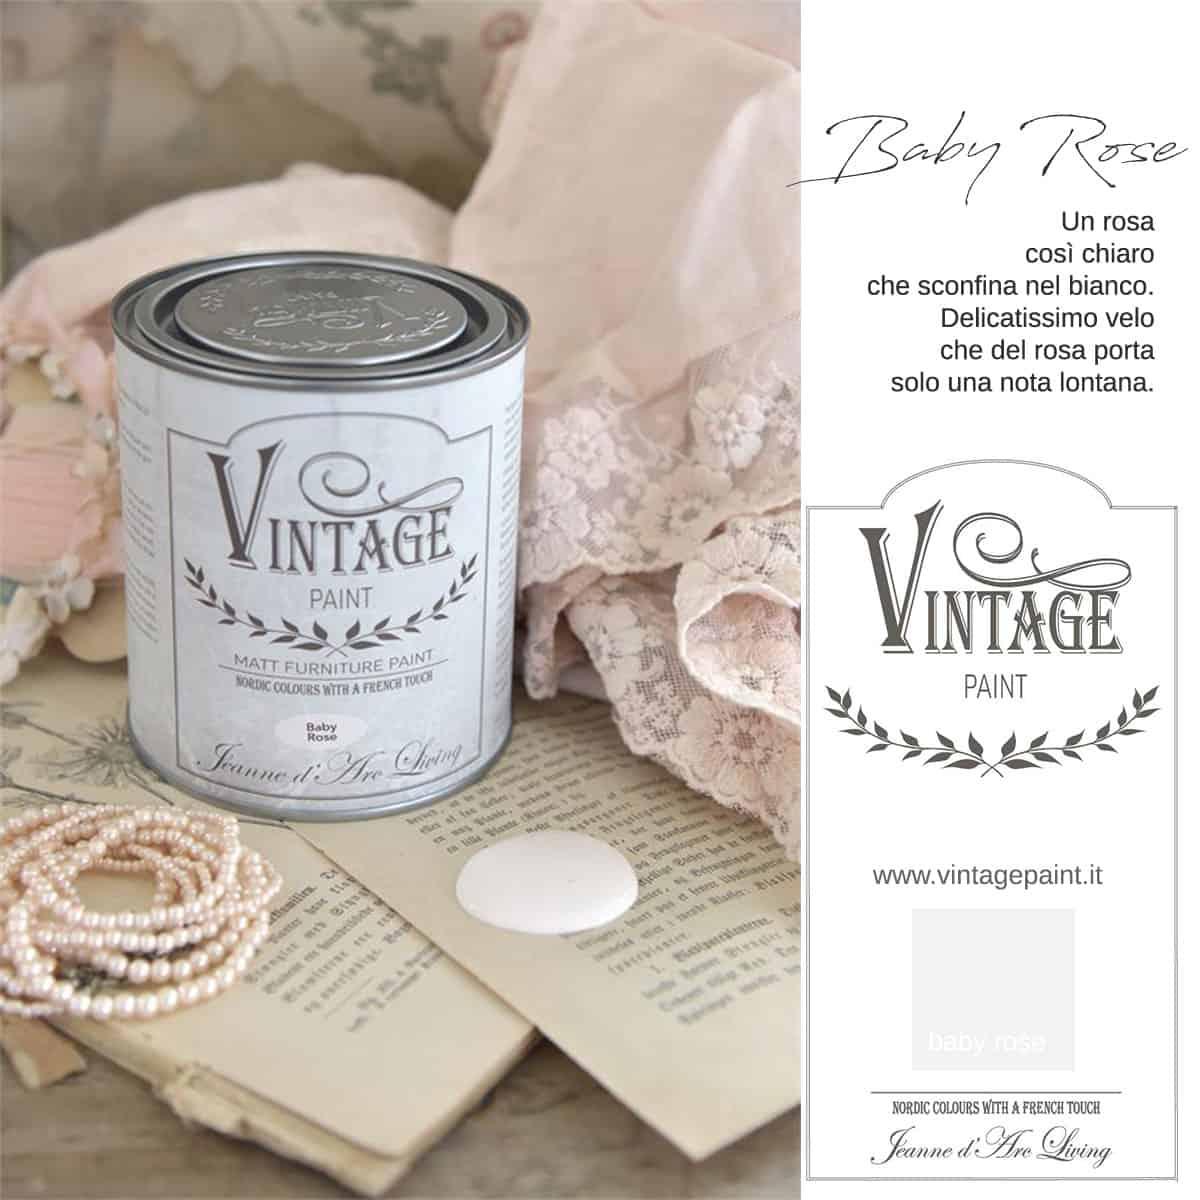 baby rose rosa vintage chalk paint vernici shabby chic autentico look gesso